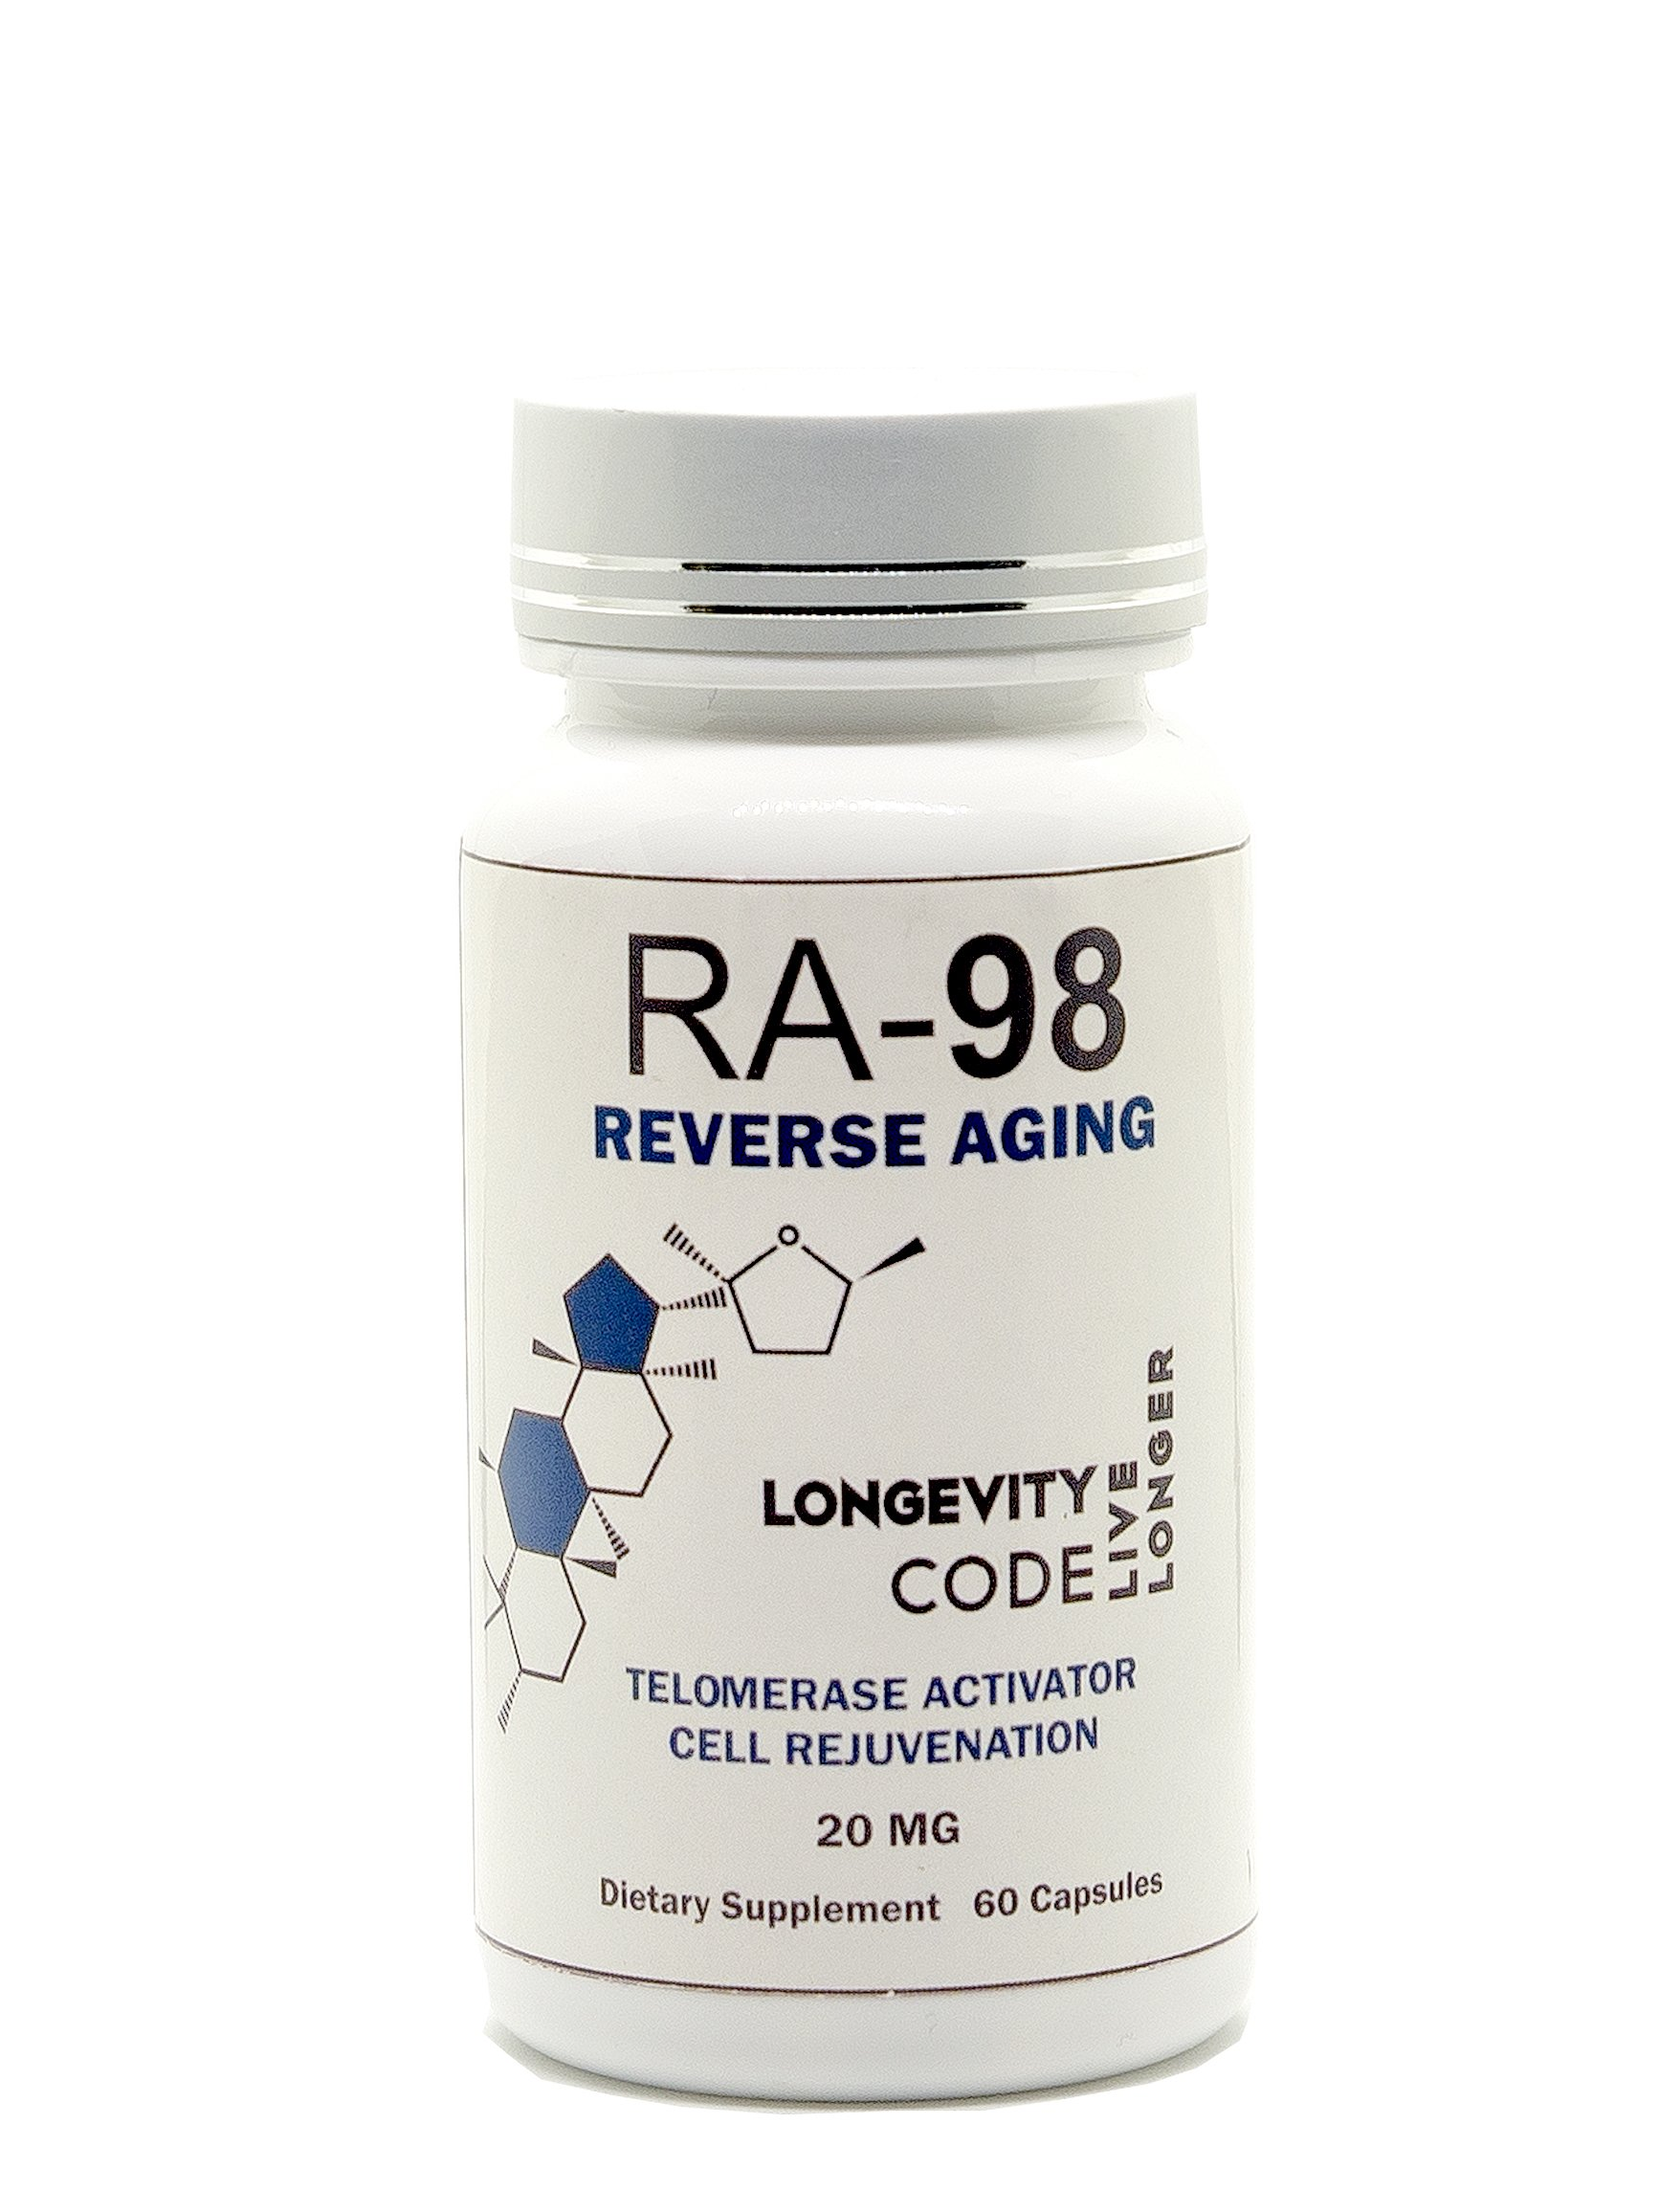 RA-98 Reverse Aging 20mg, 60 Capsules (60)